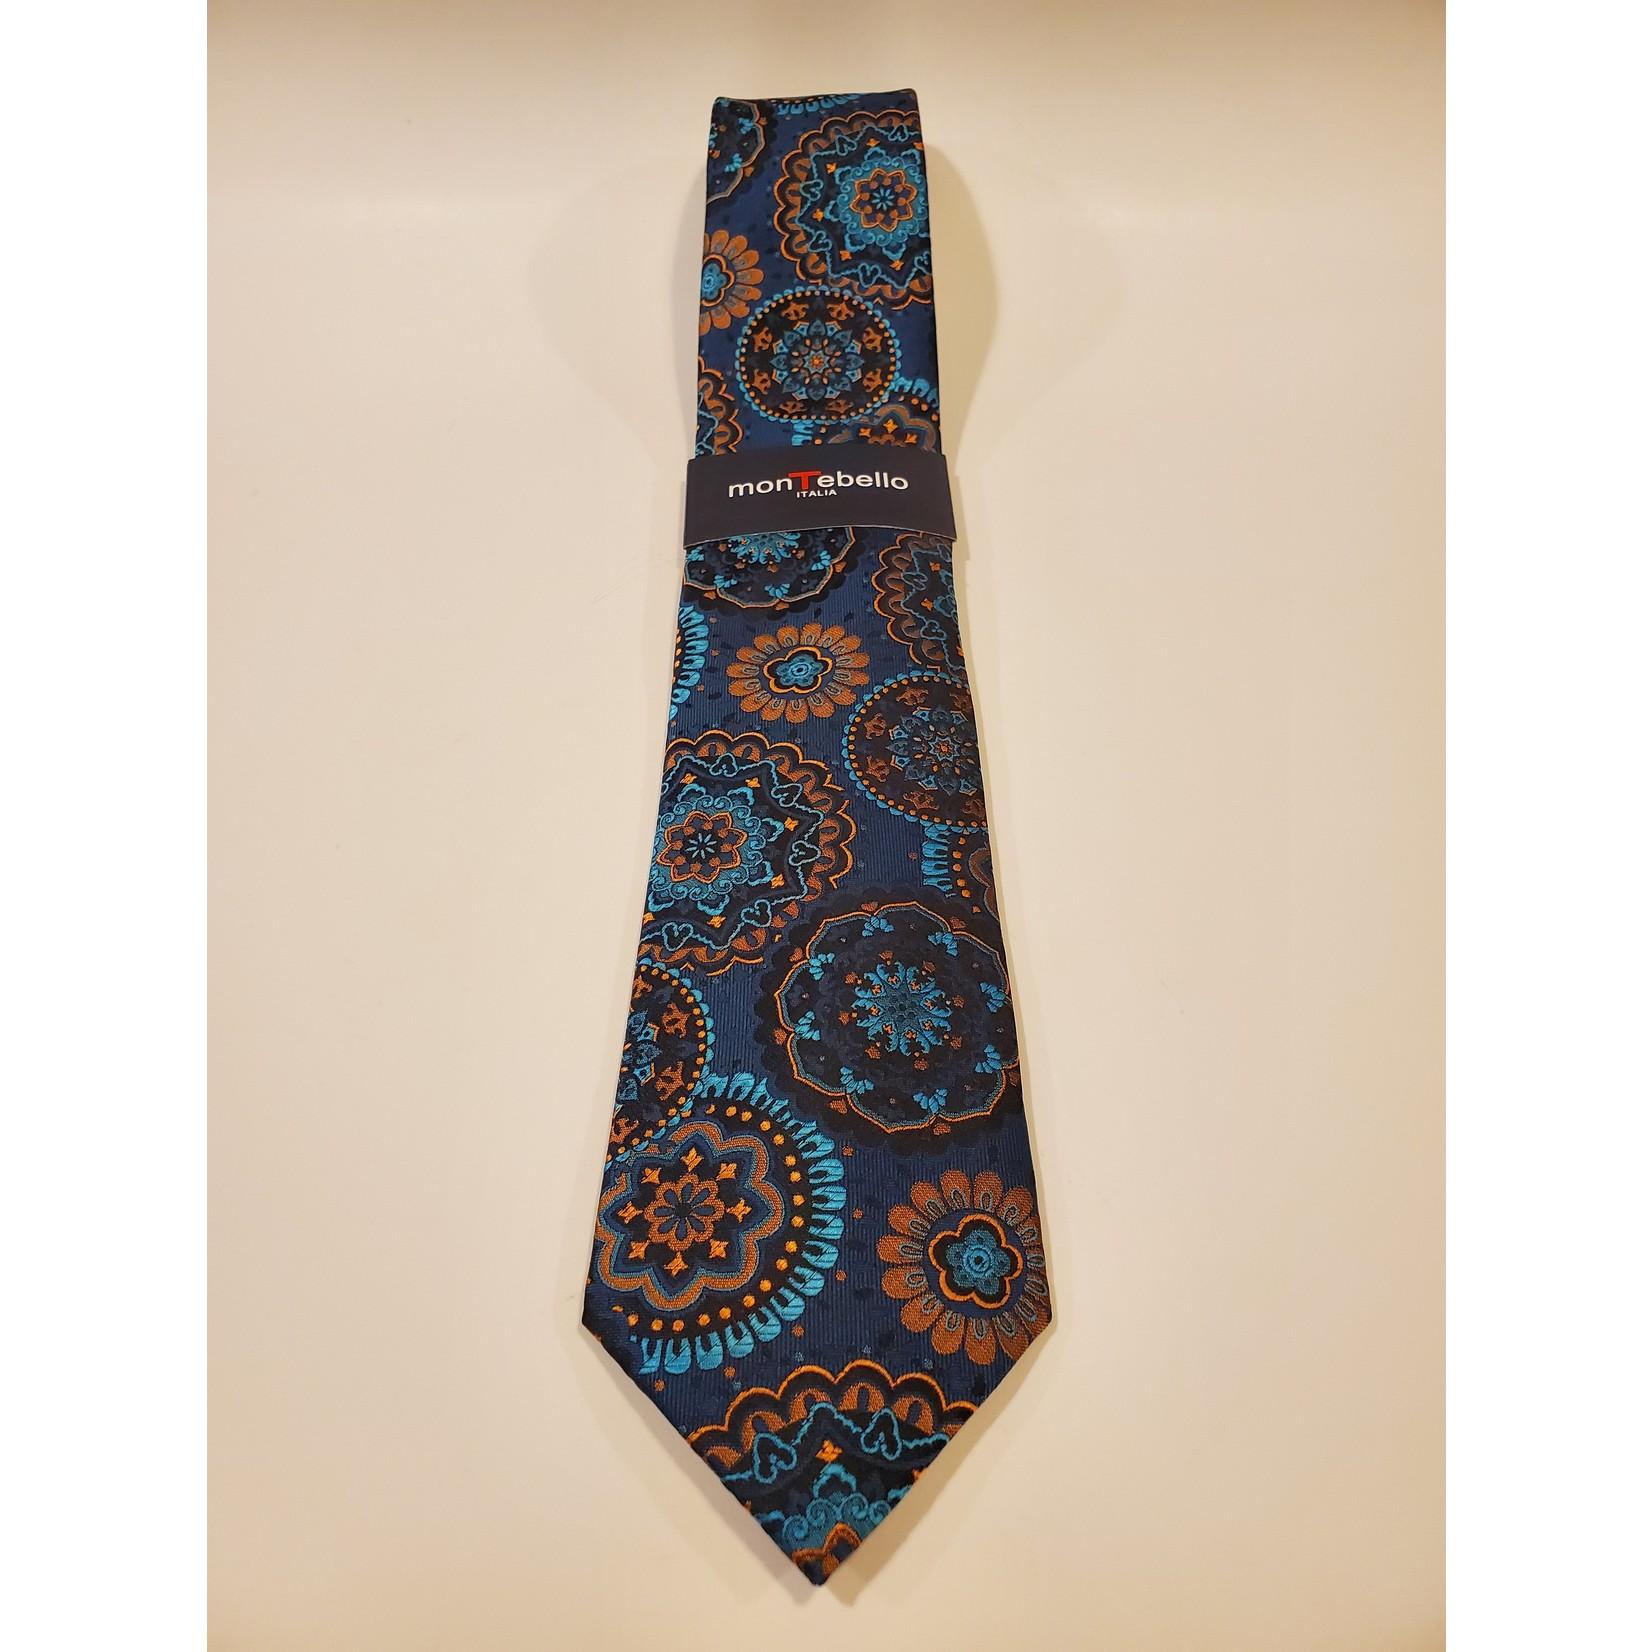 Montebello 1672 Jacquard Silk Tie - Teal Kaleidoscope Pattern